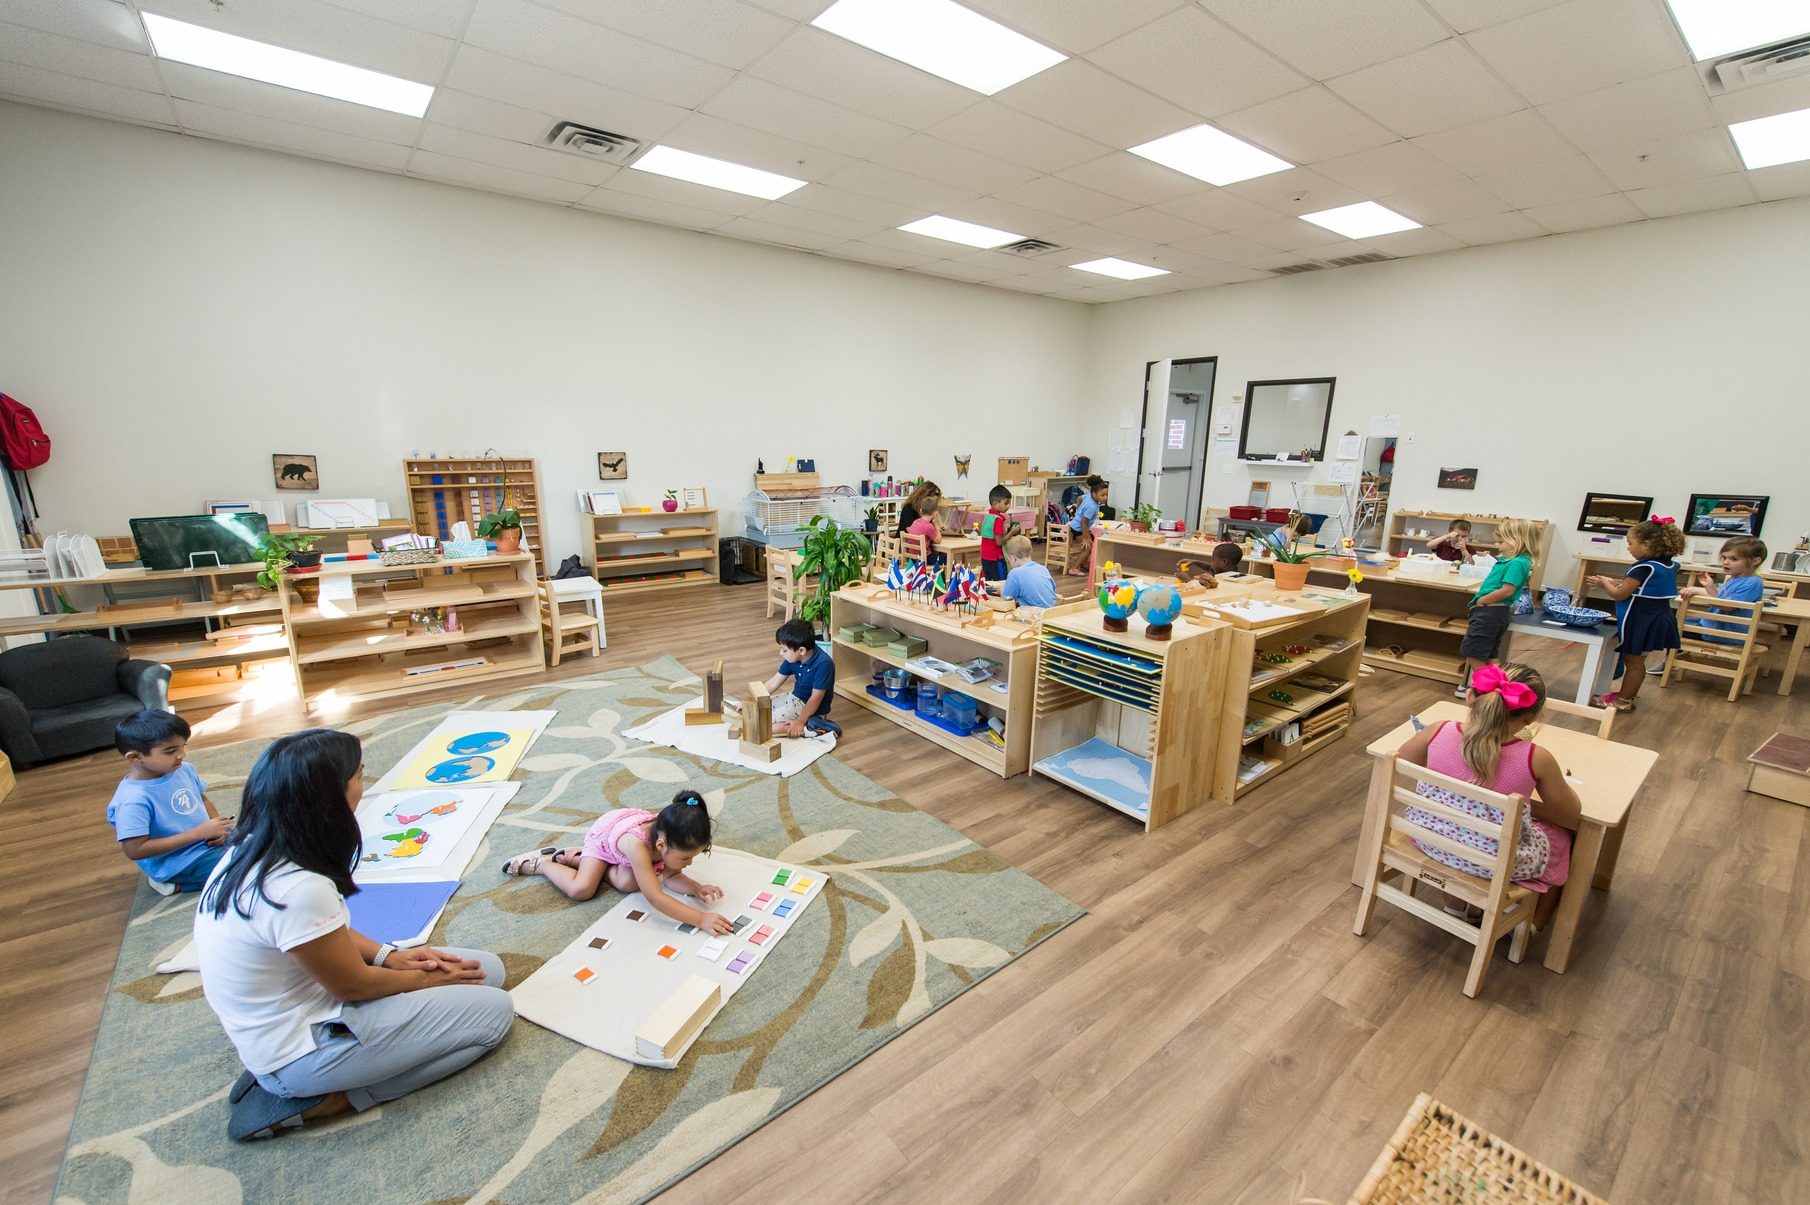 COVID-19, Physical Distancing, and Community: How Montessori Balances Children's Developmental Needs